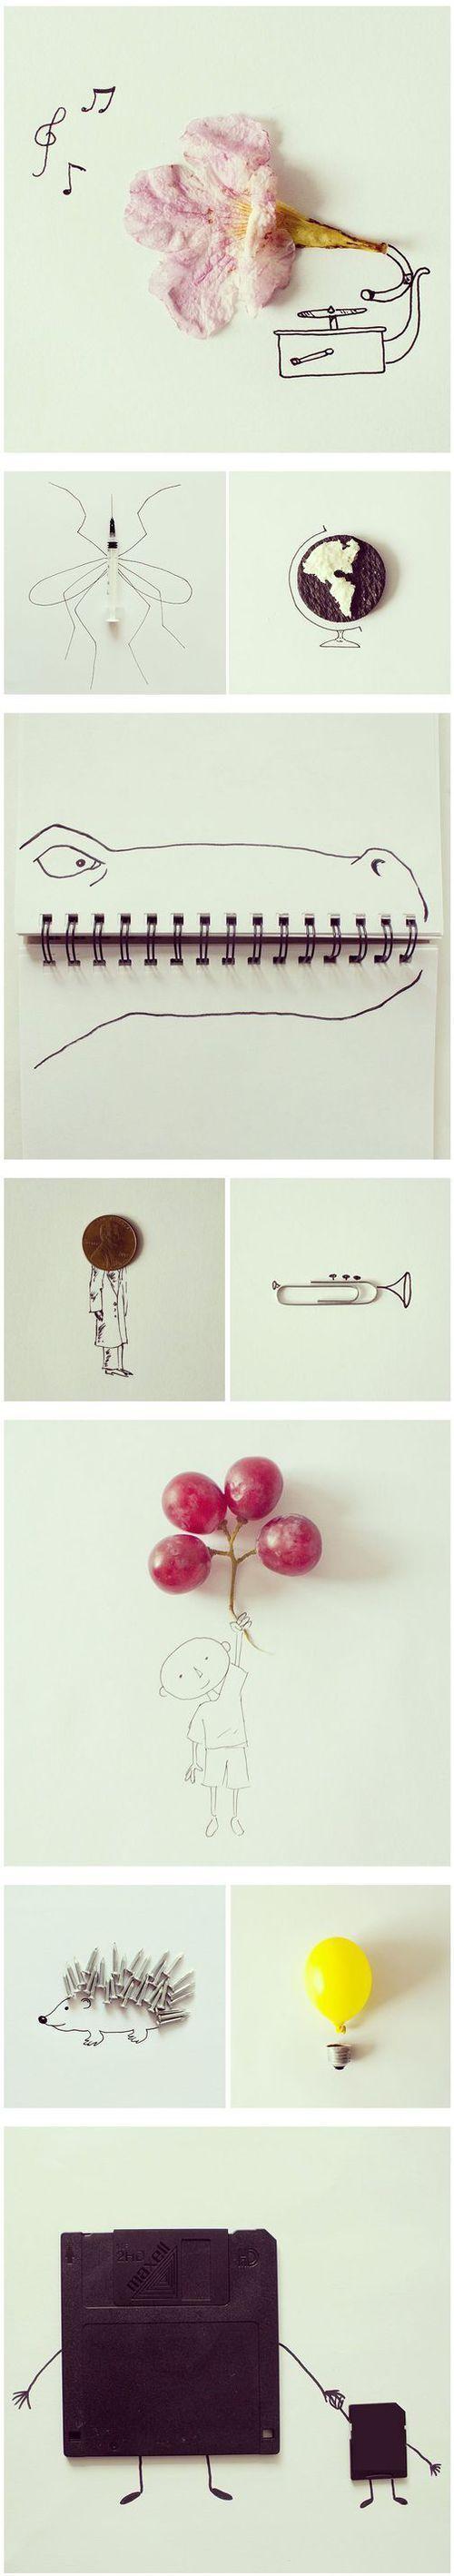 Exercices en créativité